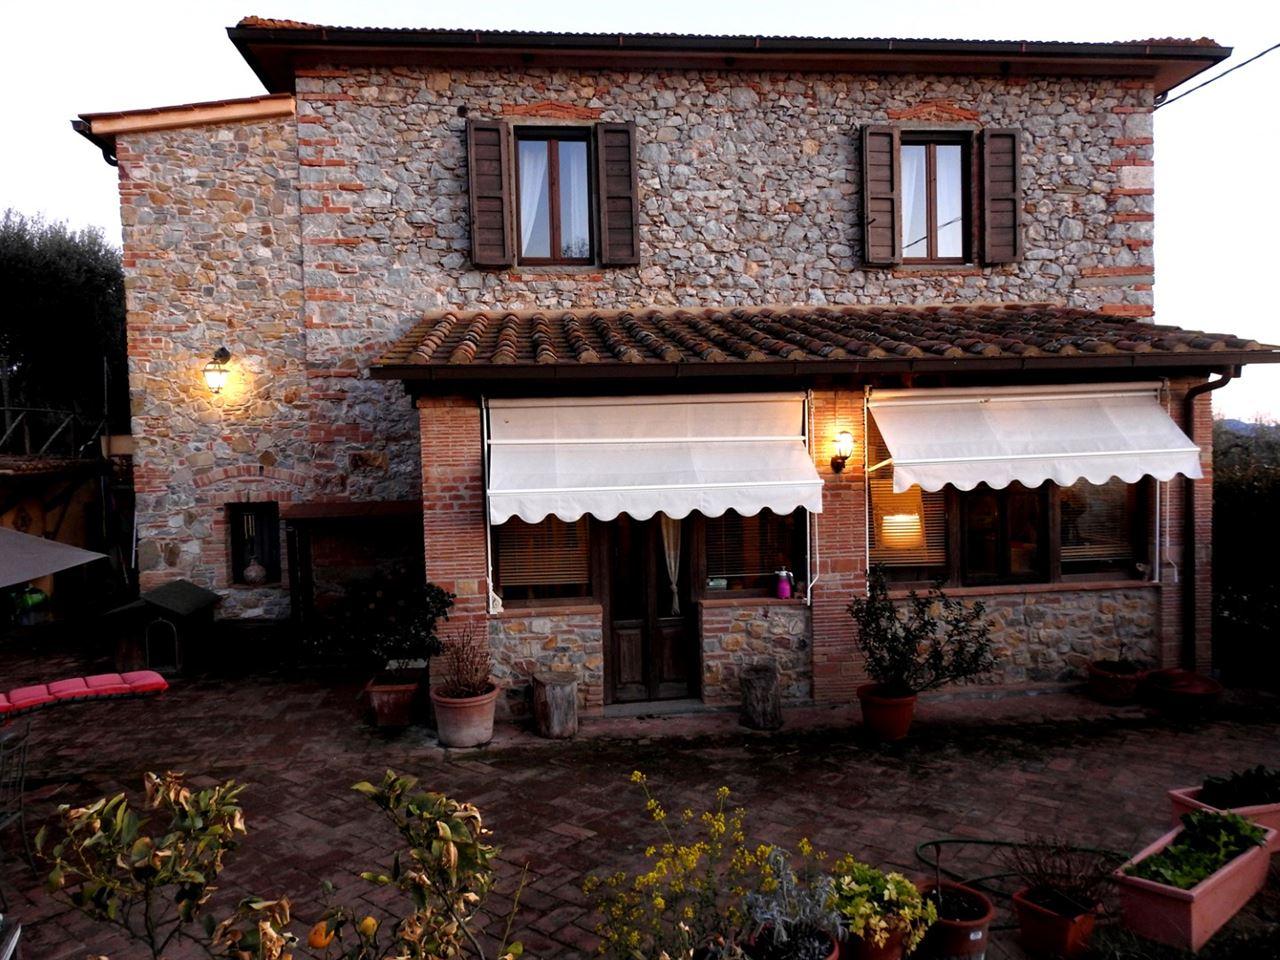 Vendita immobili rustici e casali casale 800 - Casale in toscana ...